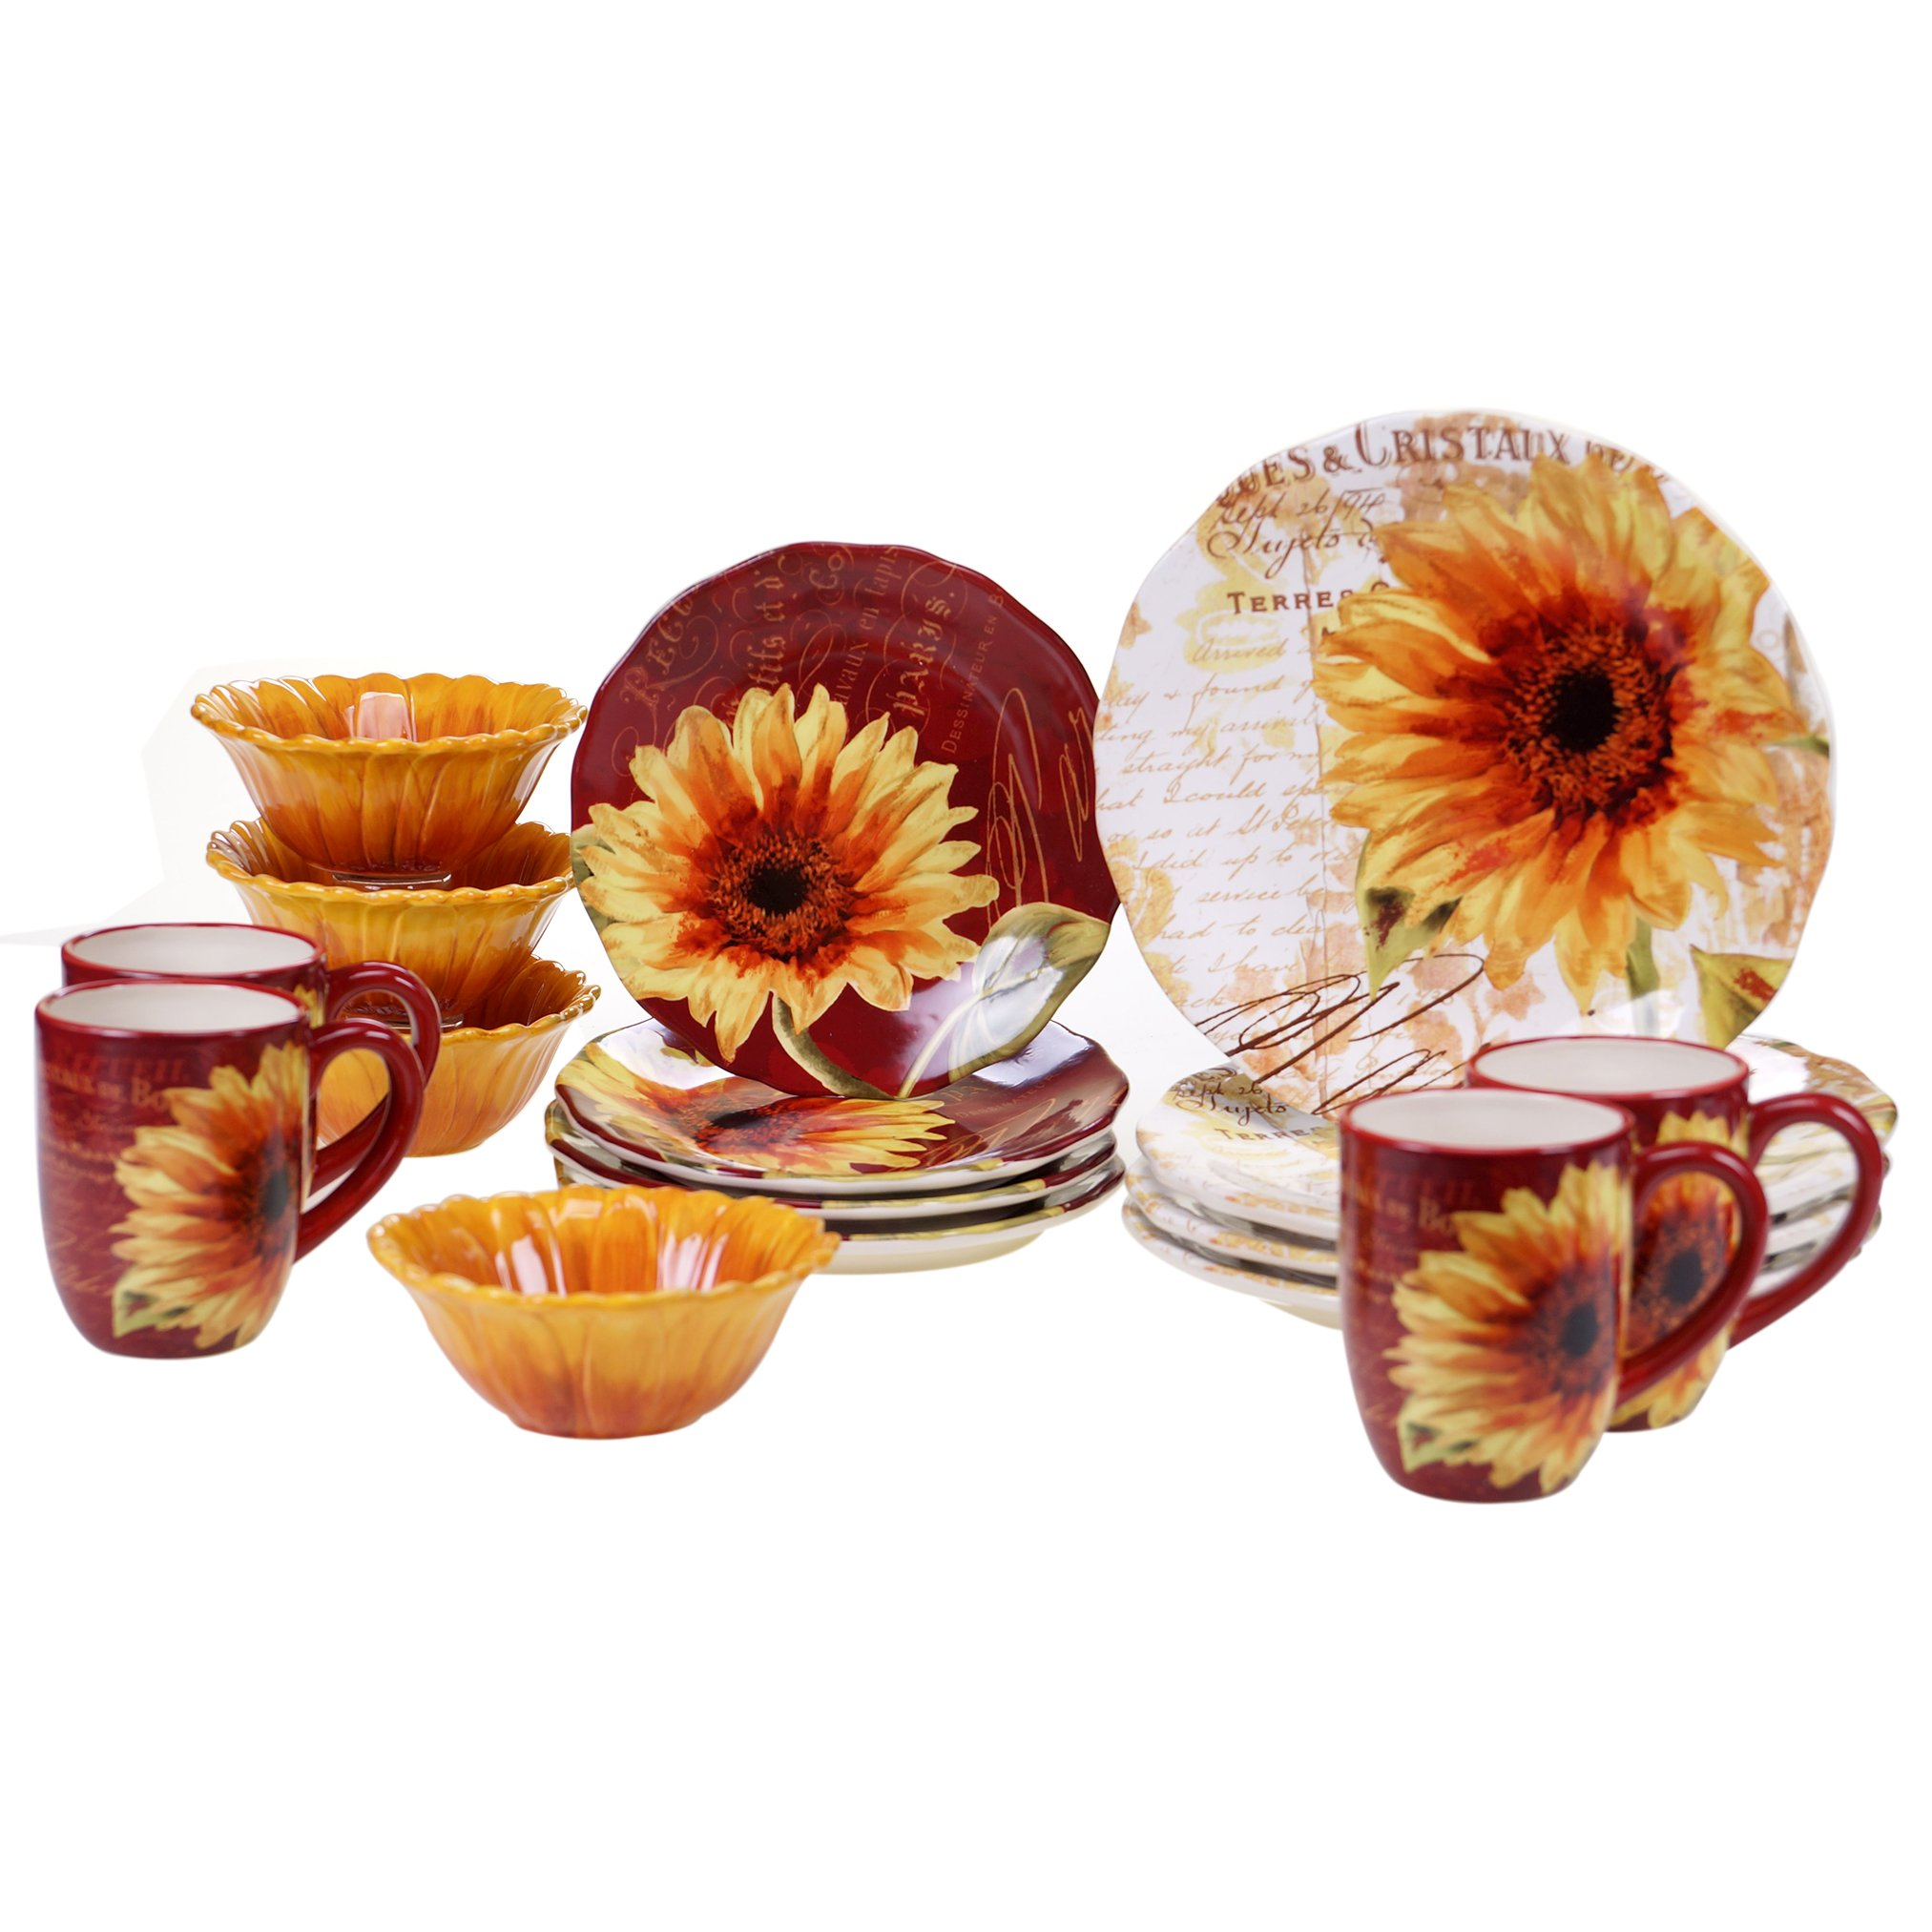 Certified International 89095 Paris Sunflower Ceramic Dinnerwae Mulitcolored